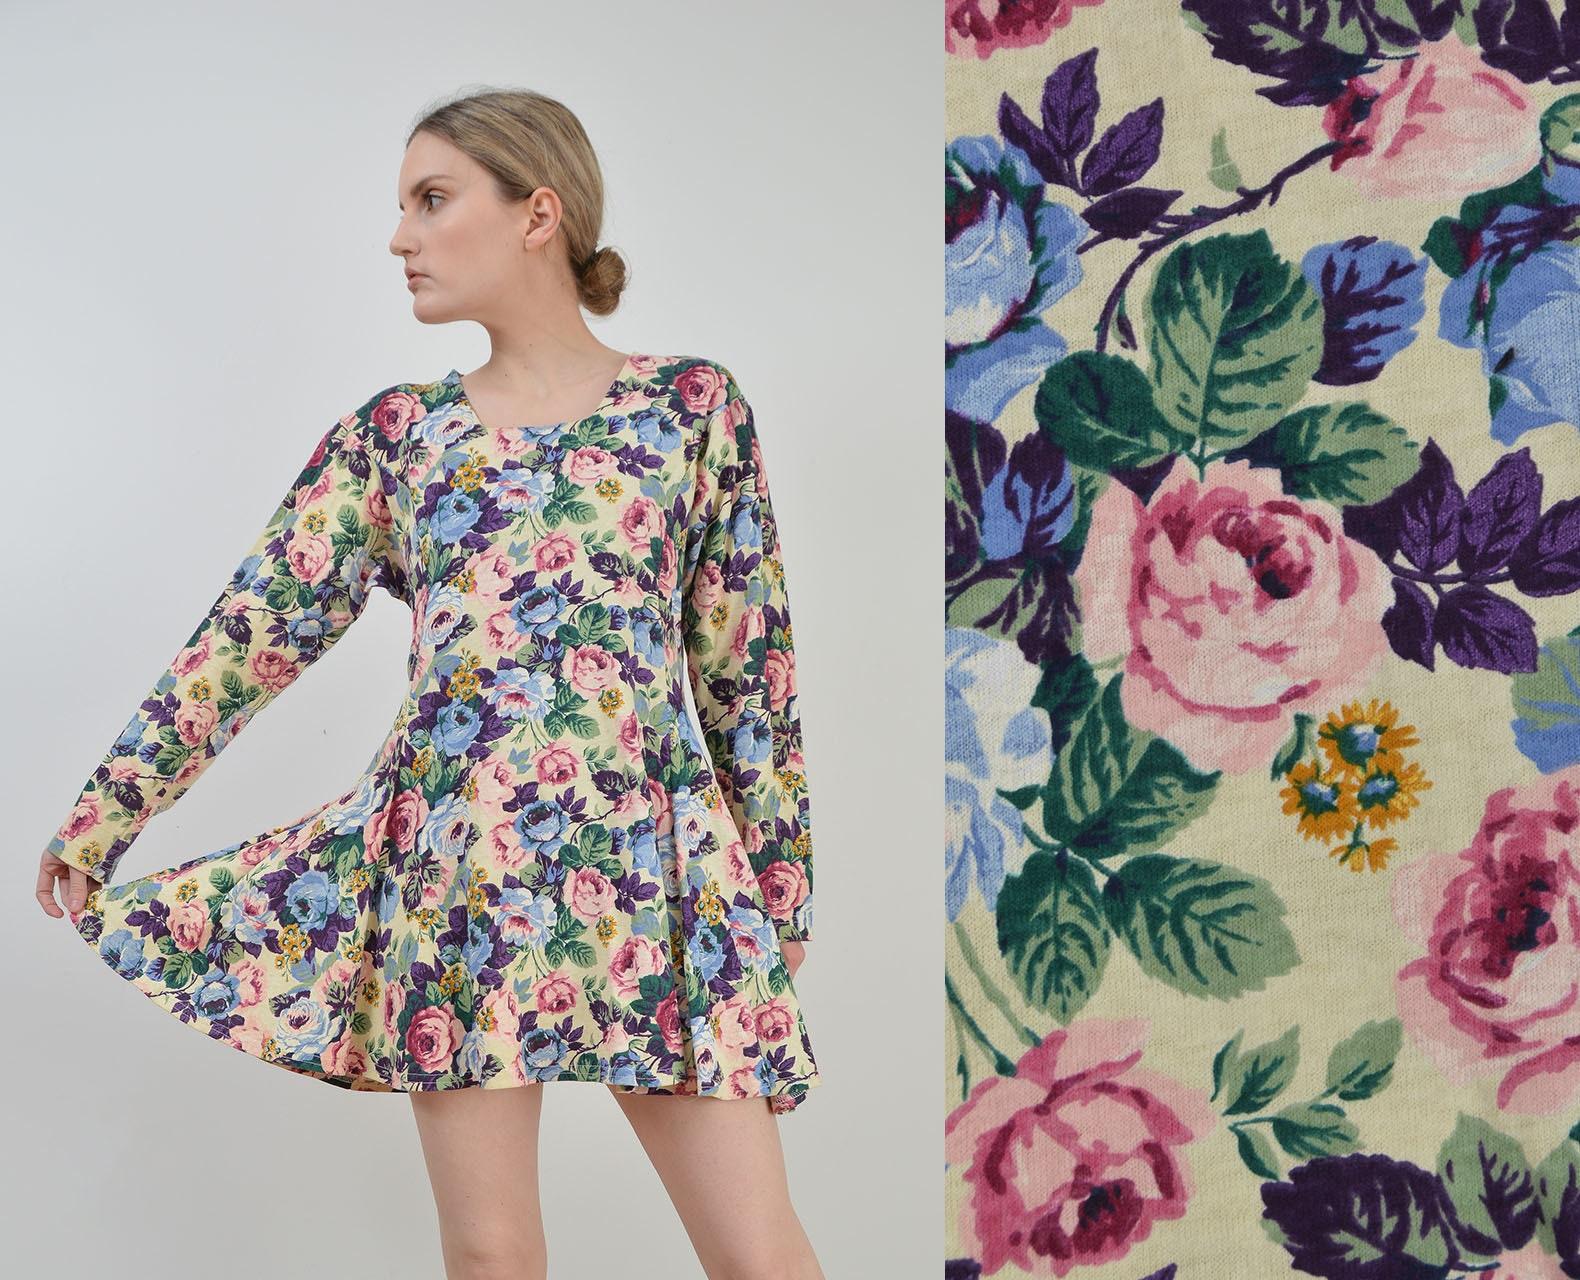 80s Dresses | Casual to Party Dresses Vintage 90S Floral Mini Dress  Boho Grunge Fit  Flare Cotton Jersey Knit Medium $0.00 AT vintagedancer.com